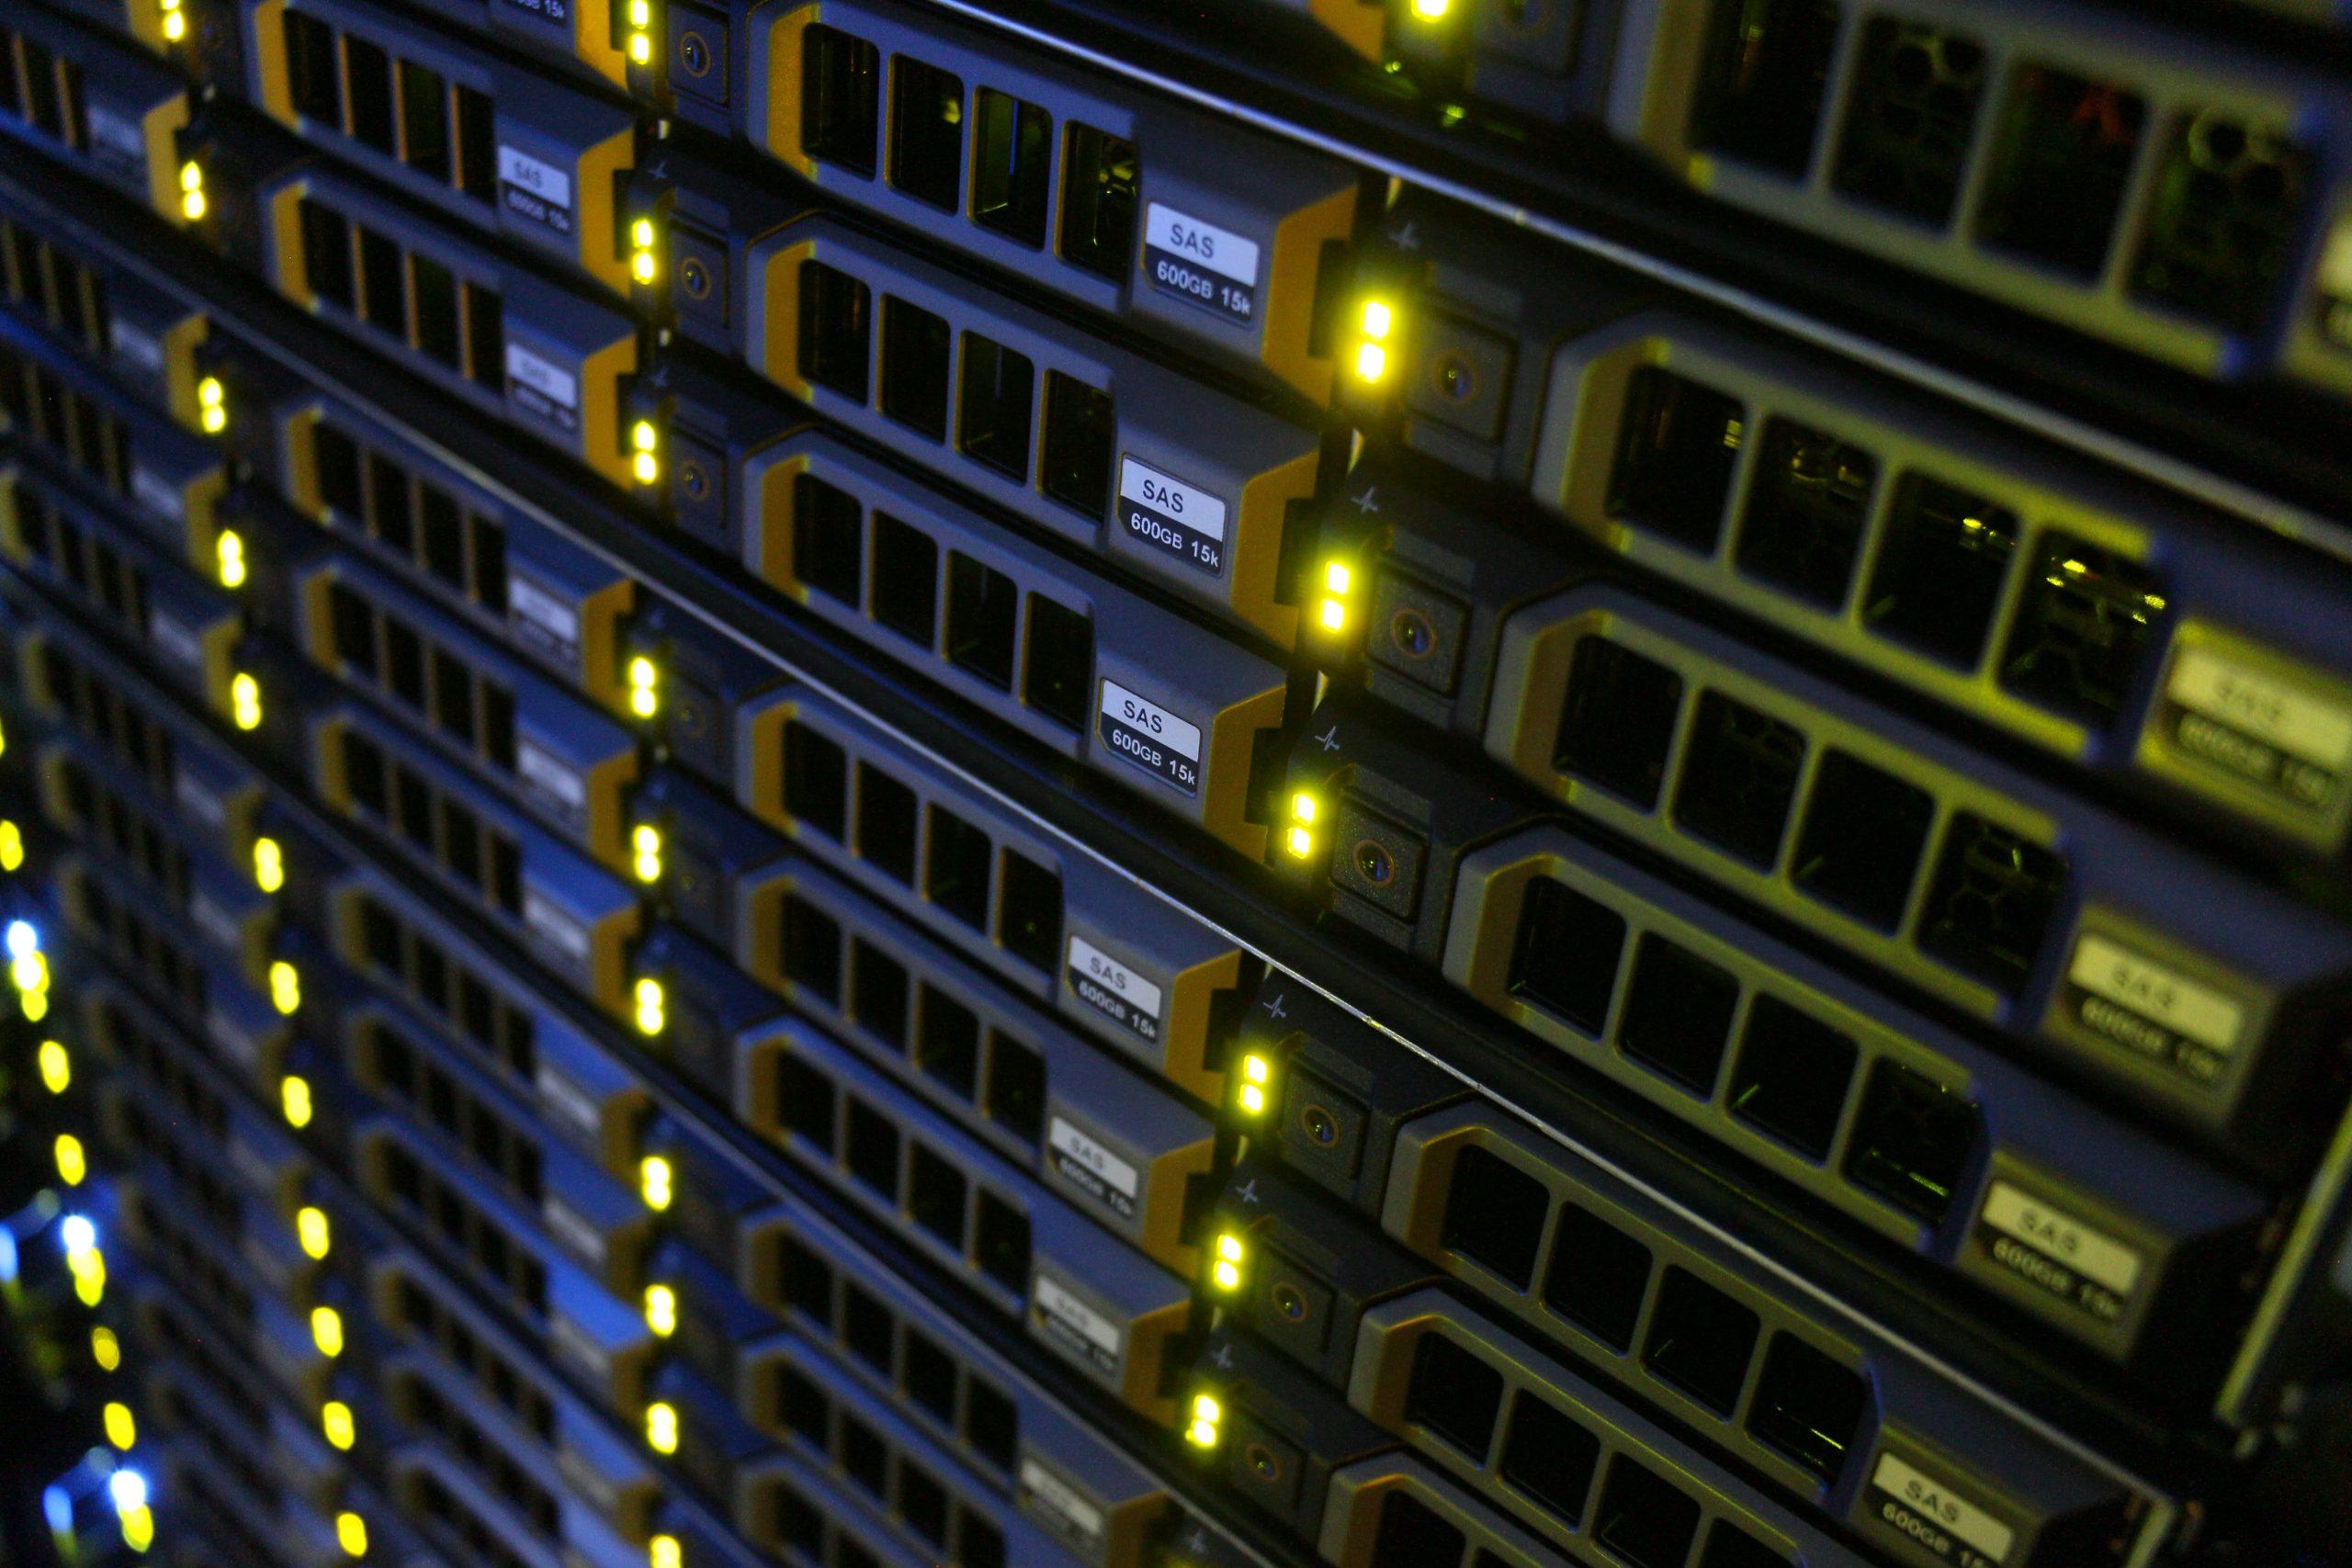 server_racks